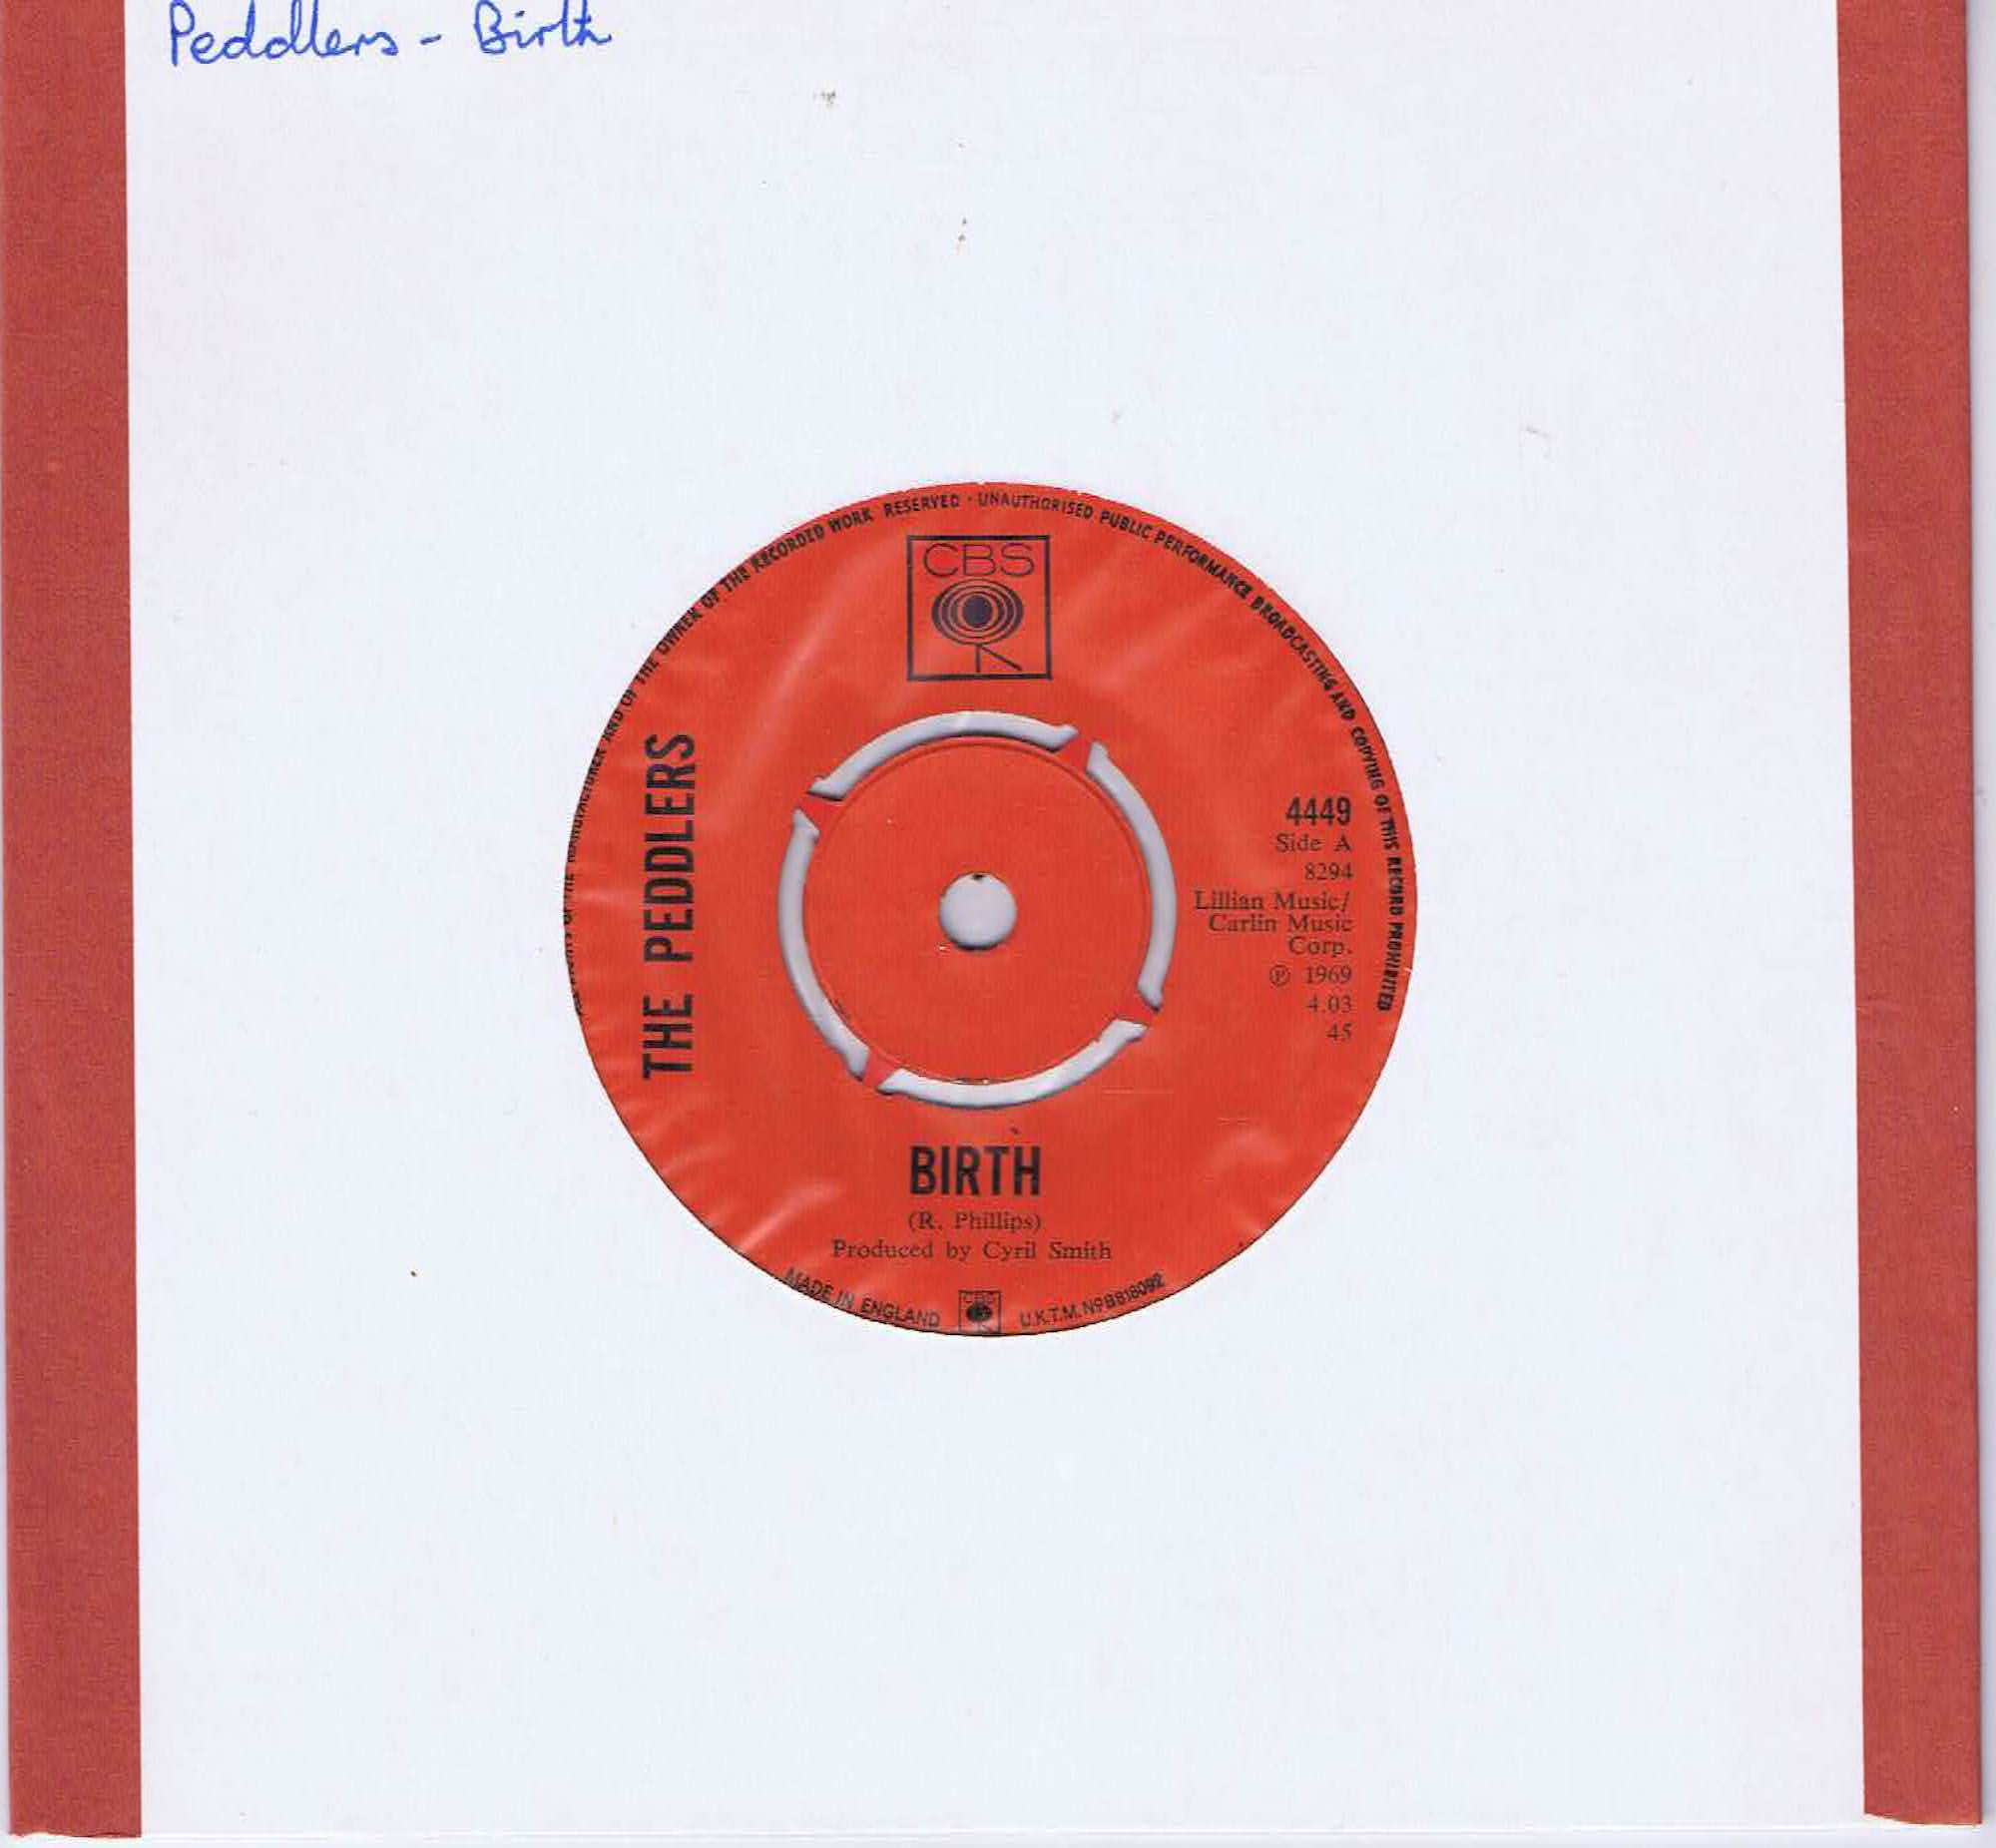 The Peddlers – Birth - CBS 4449 - 7-inch Vinyl Record • Wax Vinyl Records